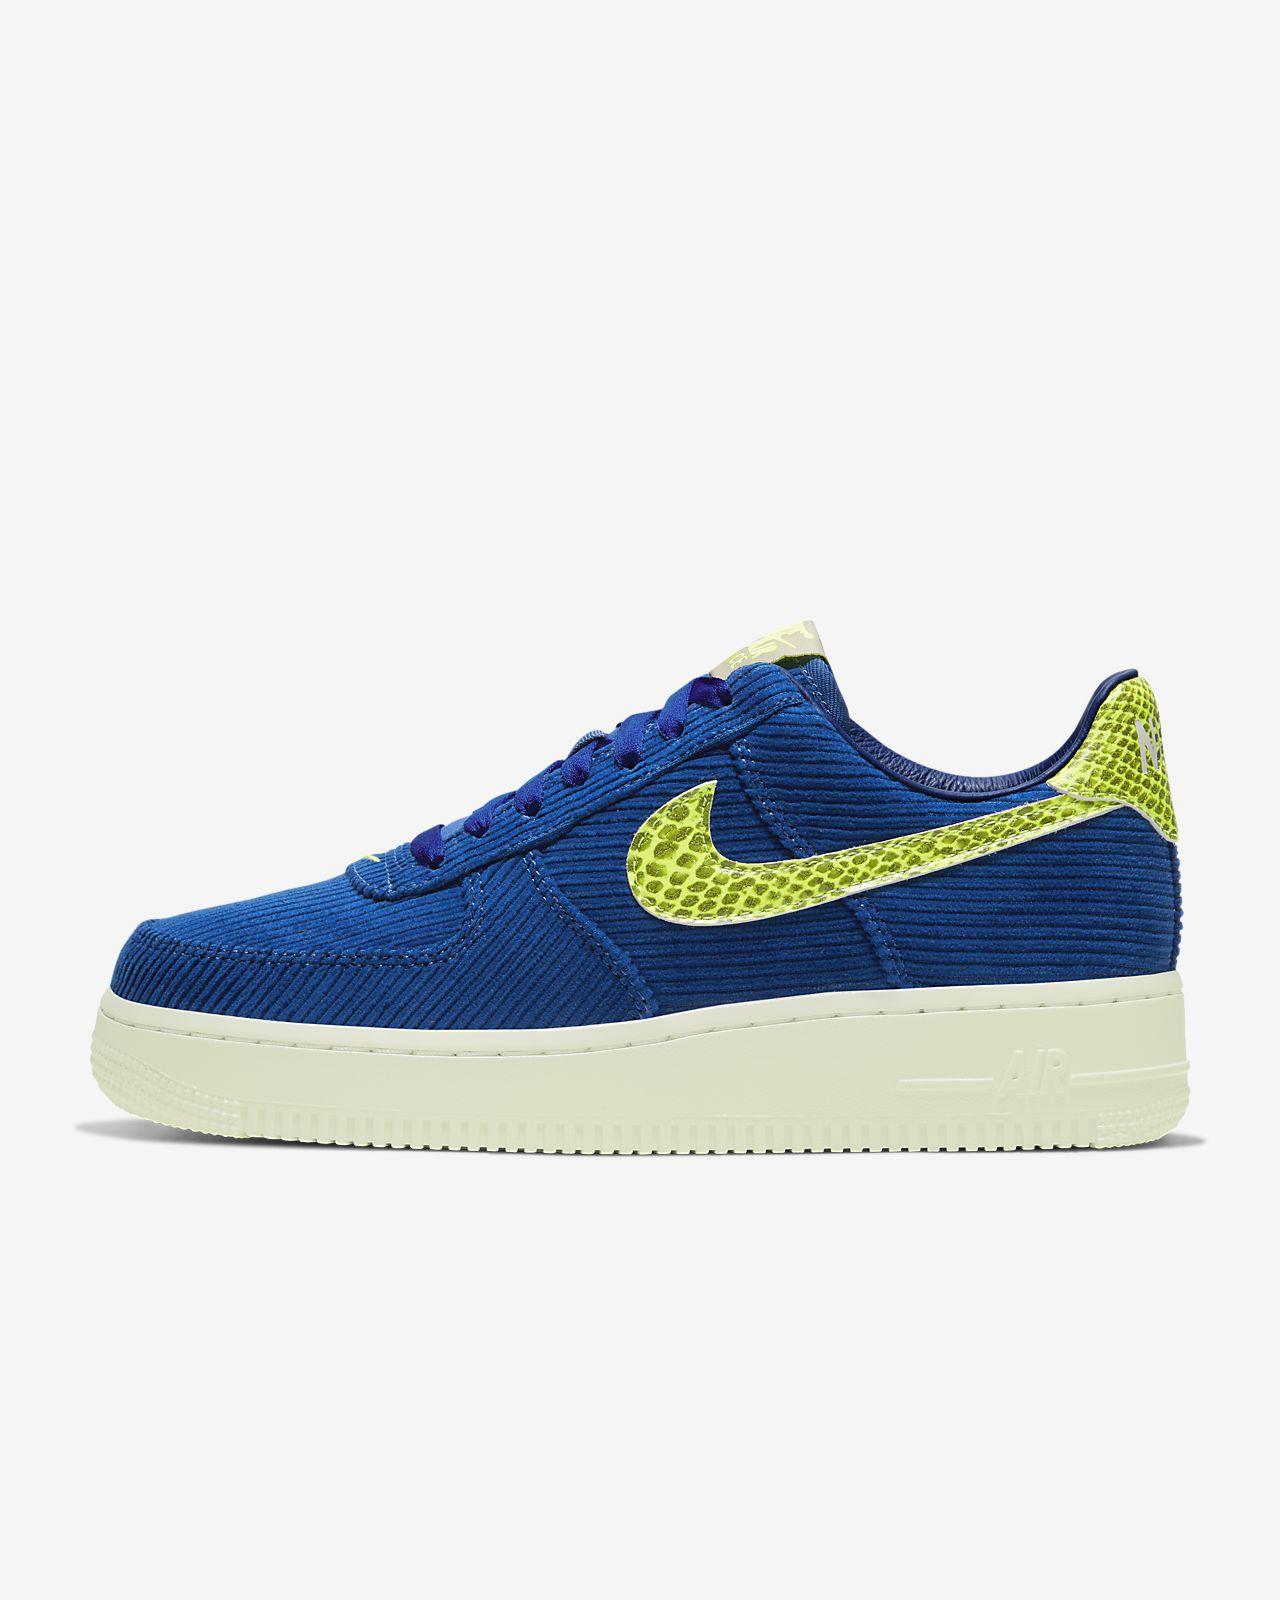 Nike Air Force 1 '07 NXN 女子运动鞋